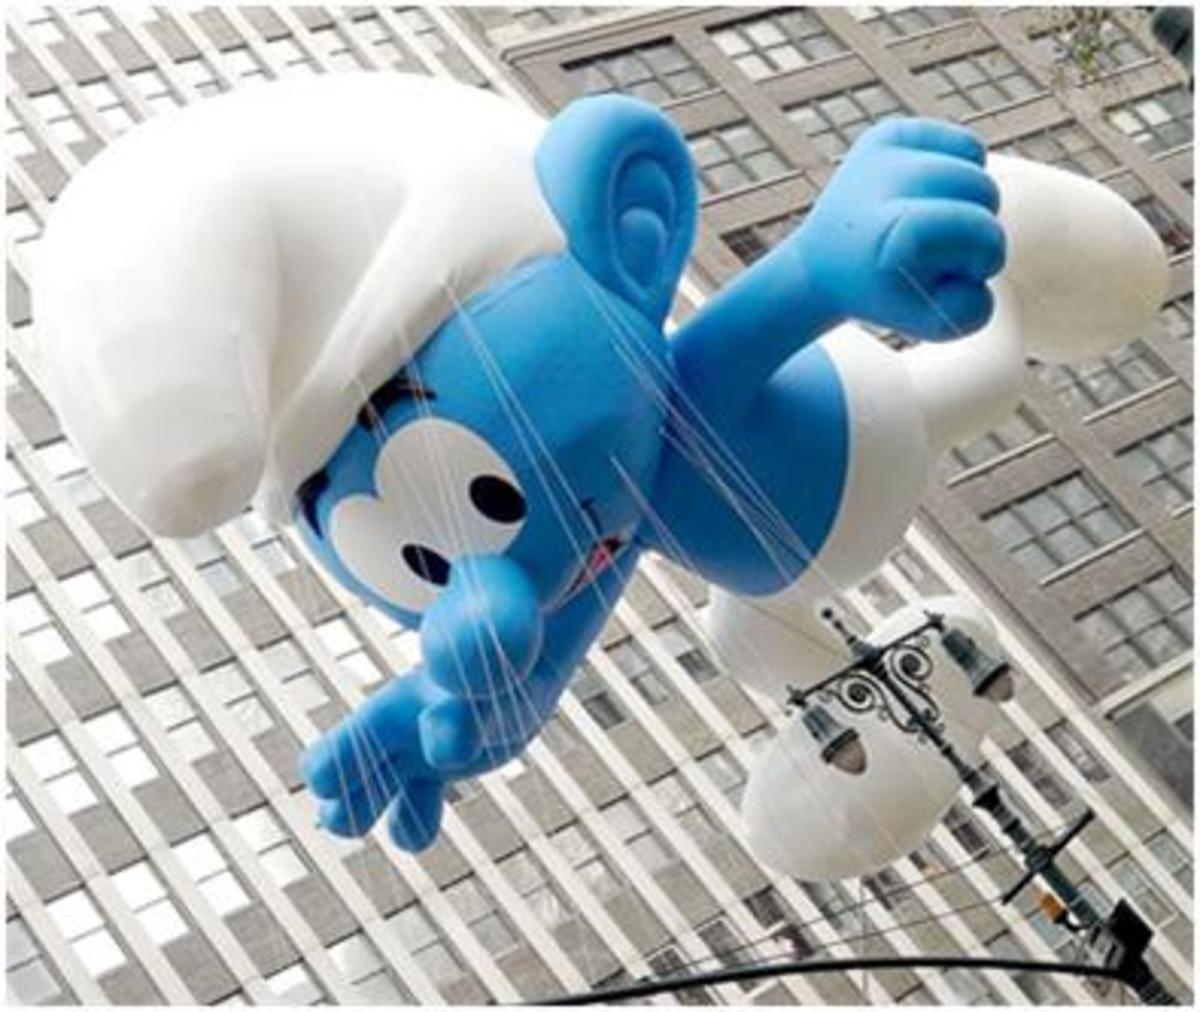 Flying Smurf!!!